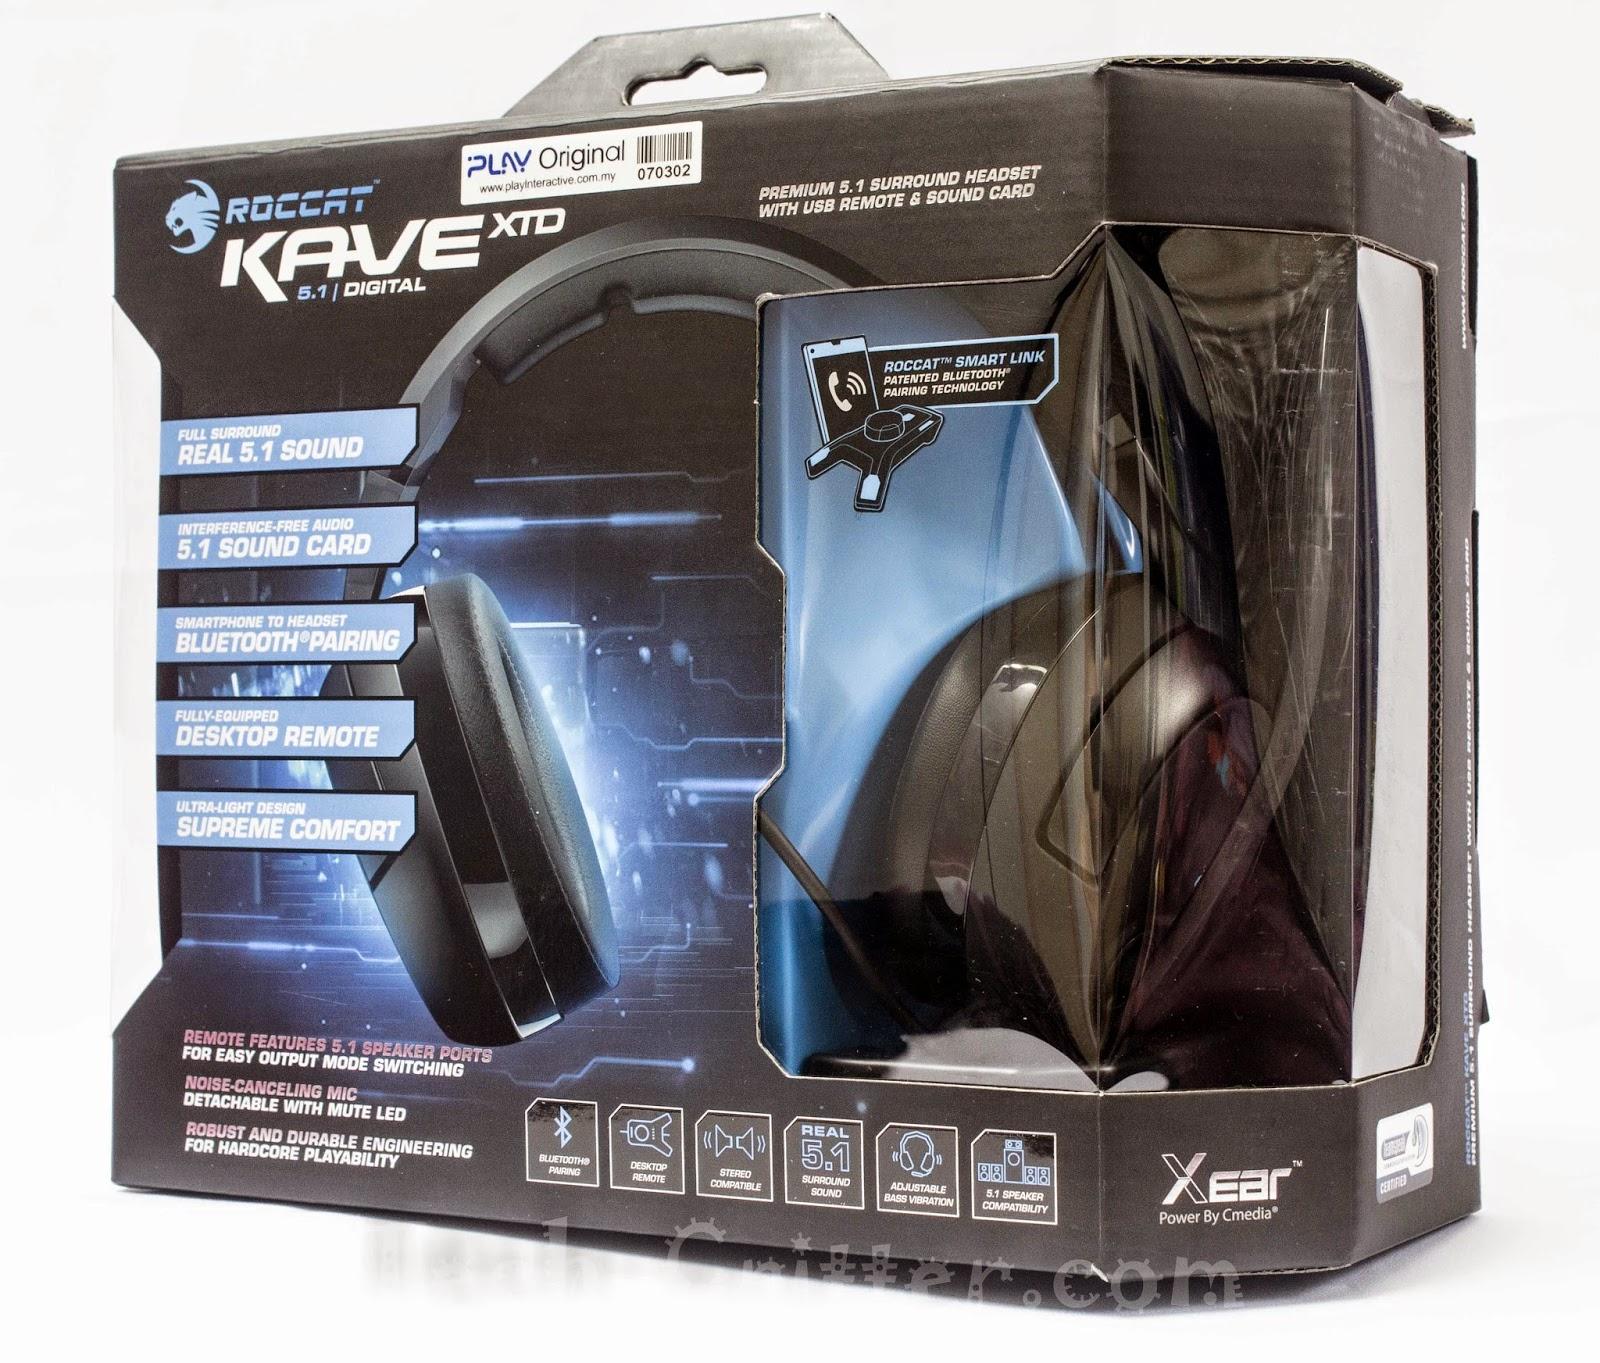 Unboxing & Review: Roccat Kave XTD 5.1 Digital Surround Sound Headset 54